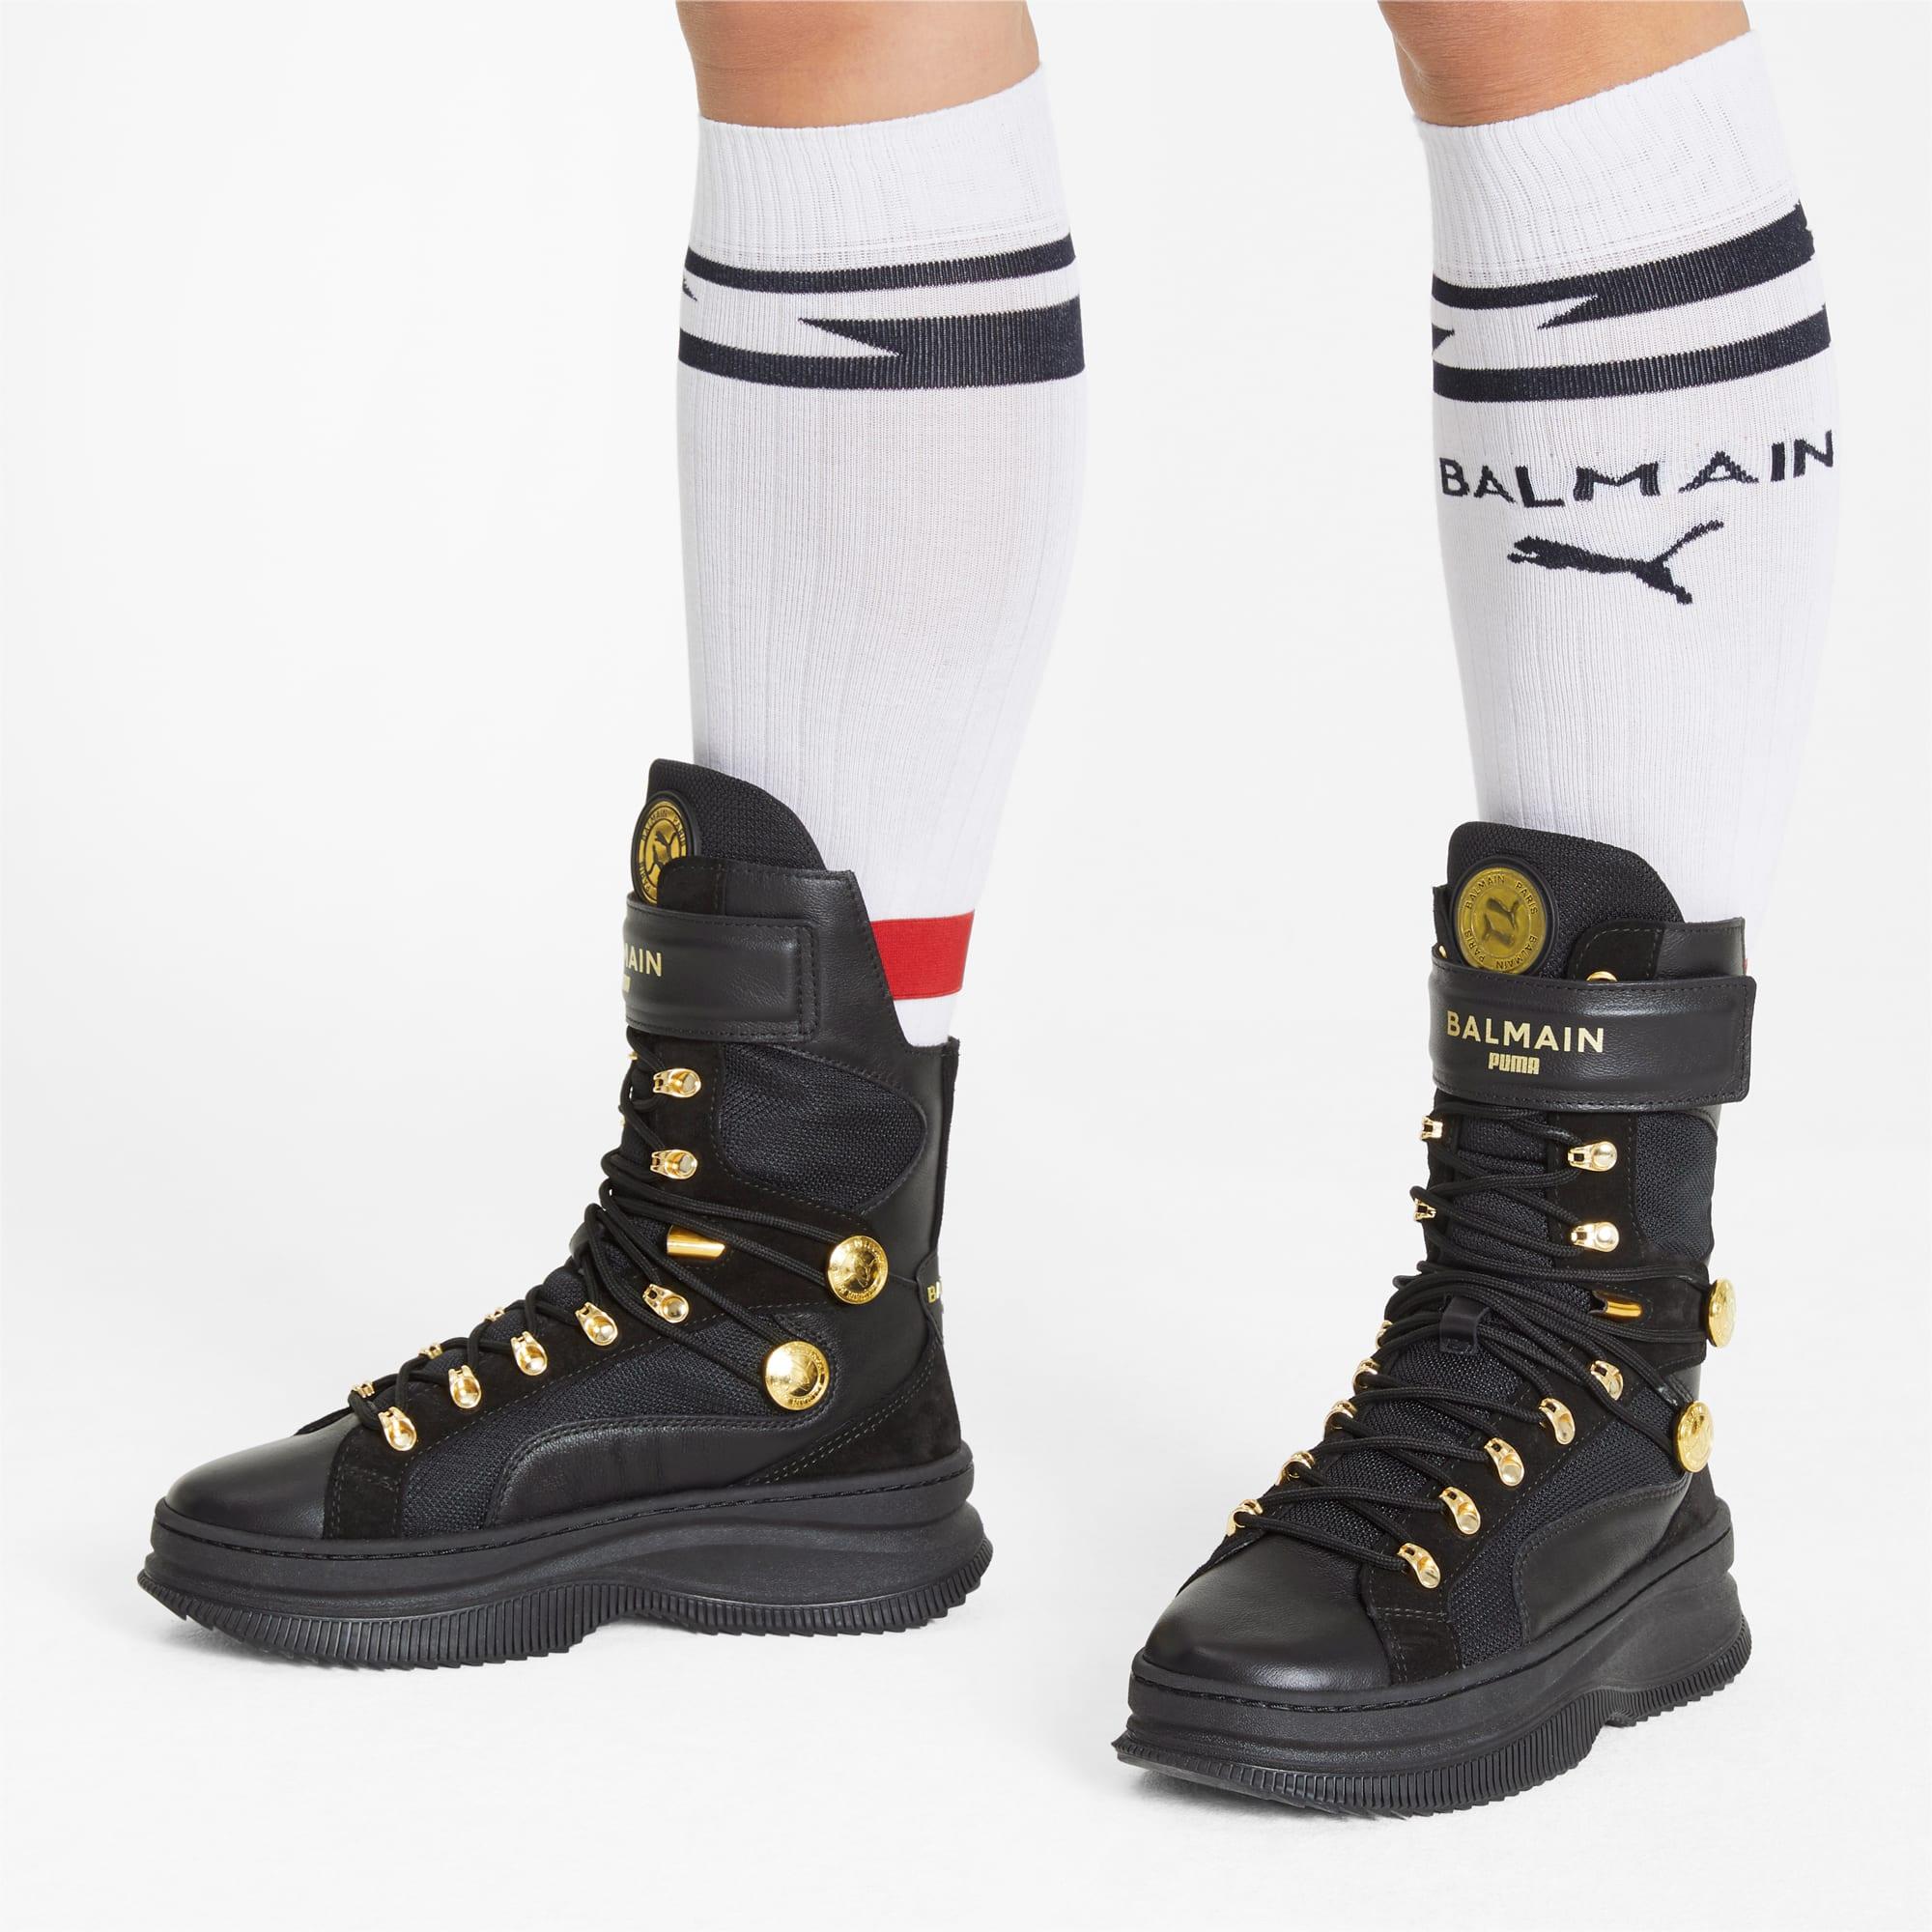 Boot Gino Rossi 4768 04 SCHWARZ Damen Schuhe Boots